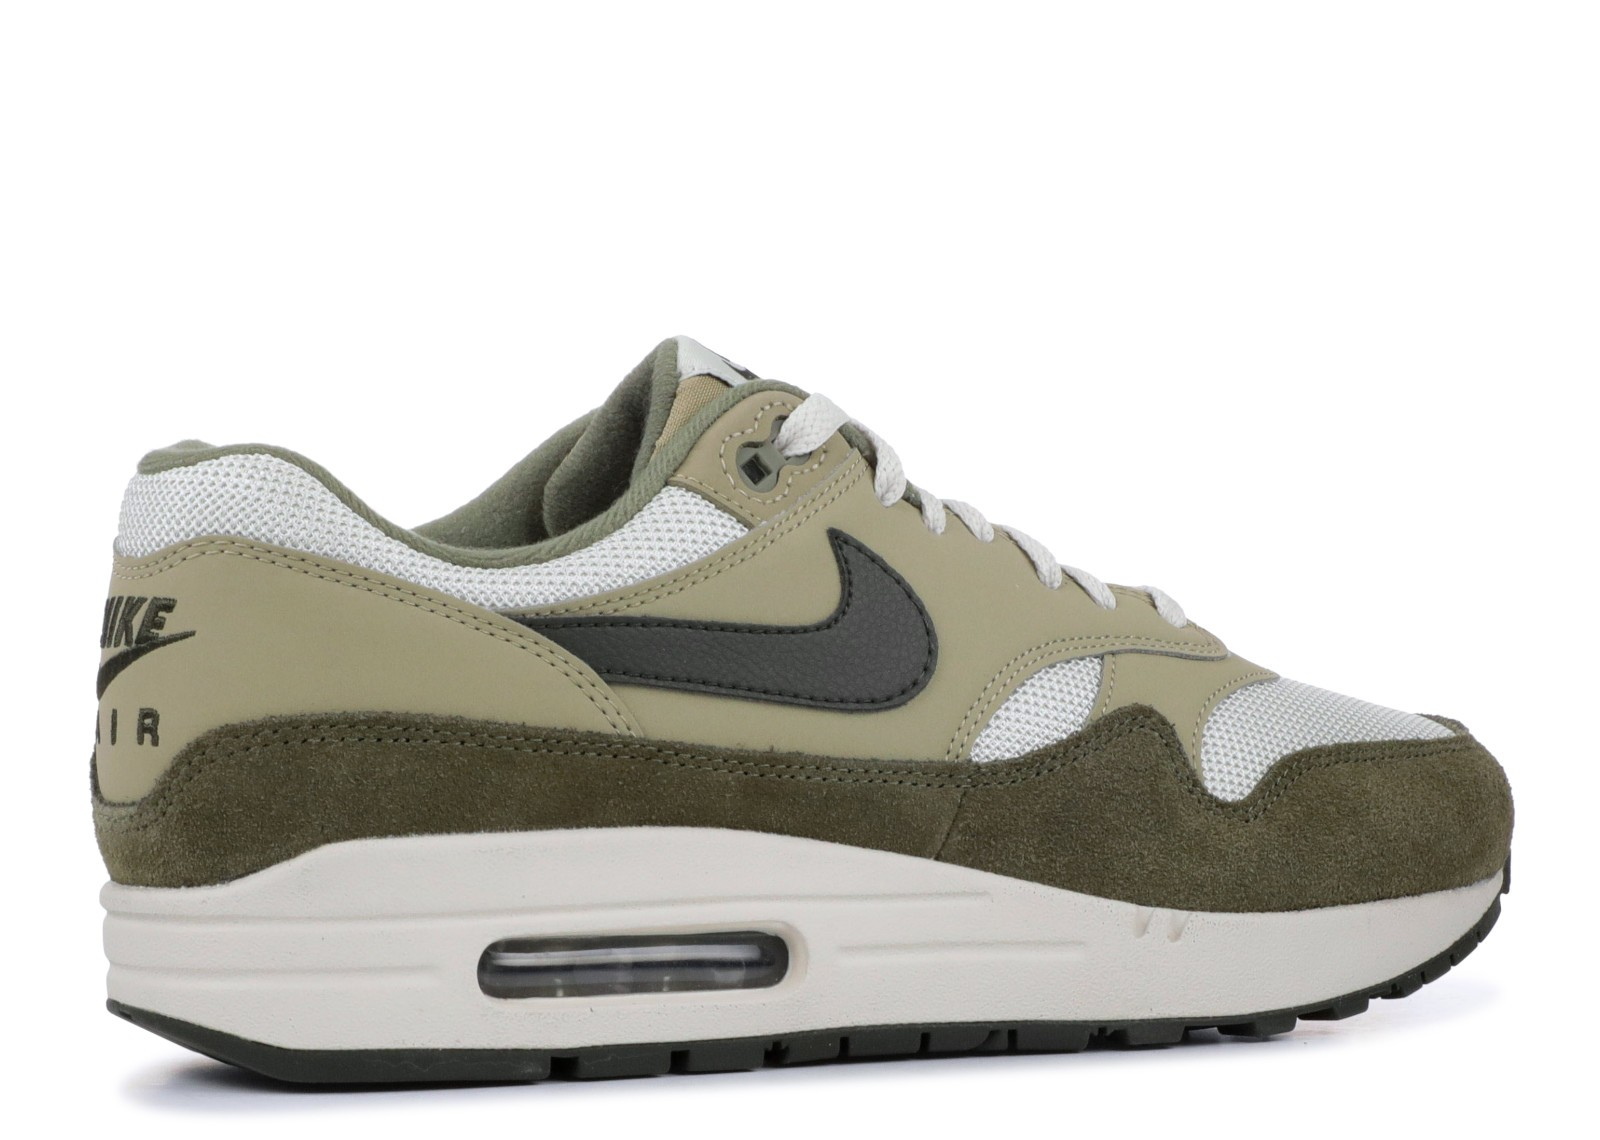 NIKE AIR MAX 1 (Medium OliveSequoia) Military Green [AH8145